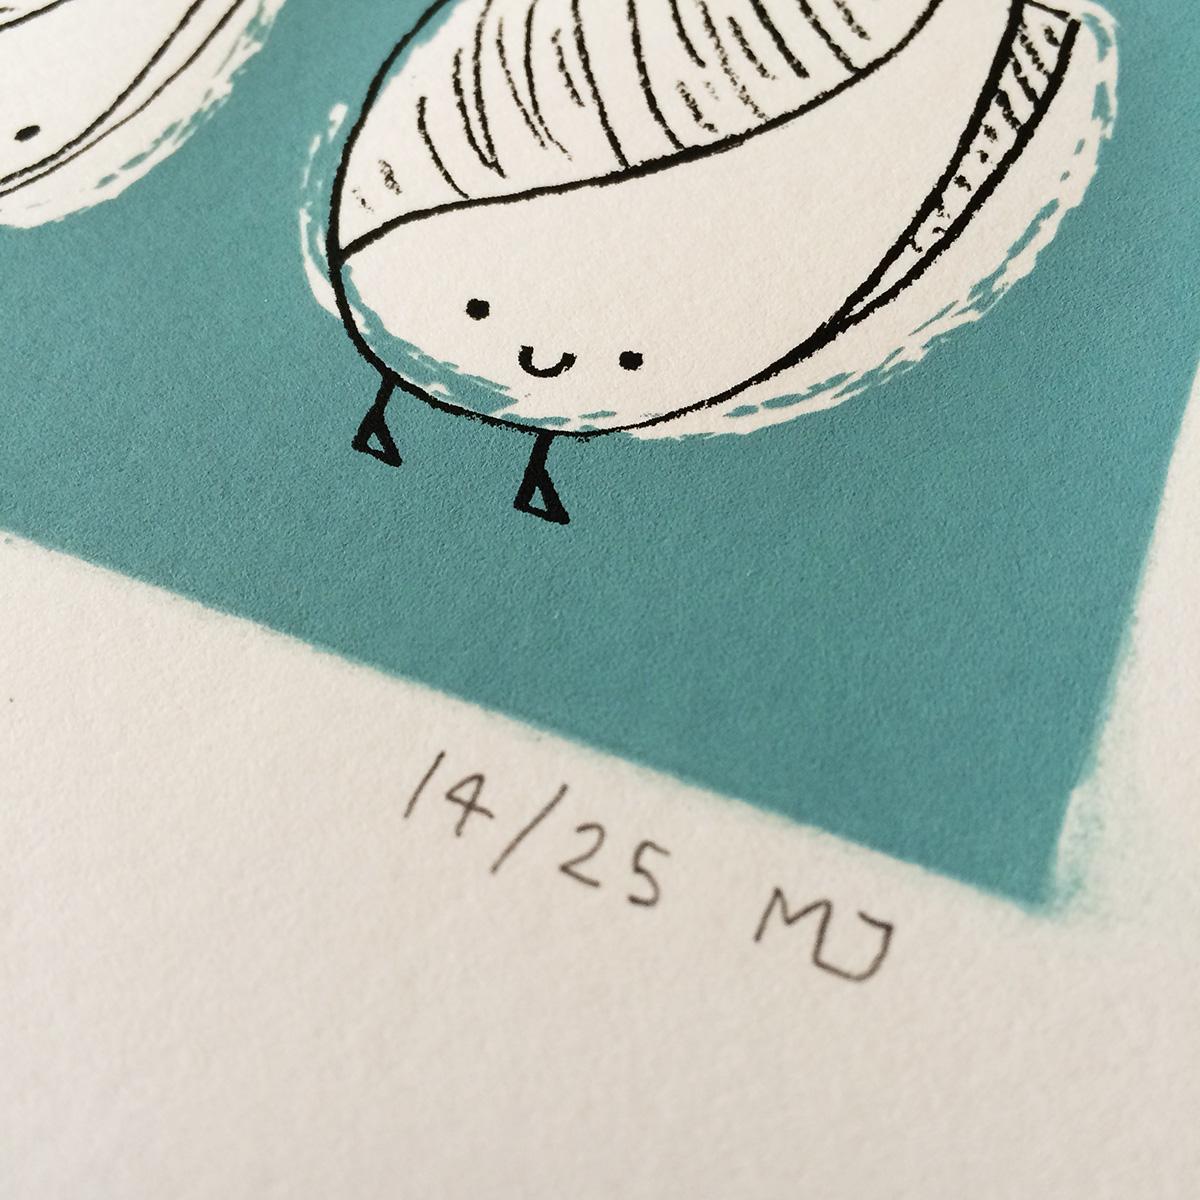 Seashell illustrated characters screen print by Matt Johnson